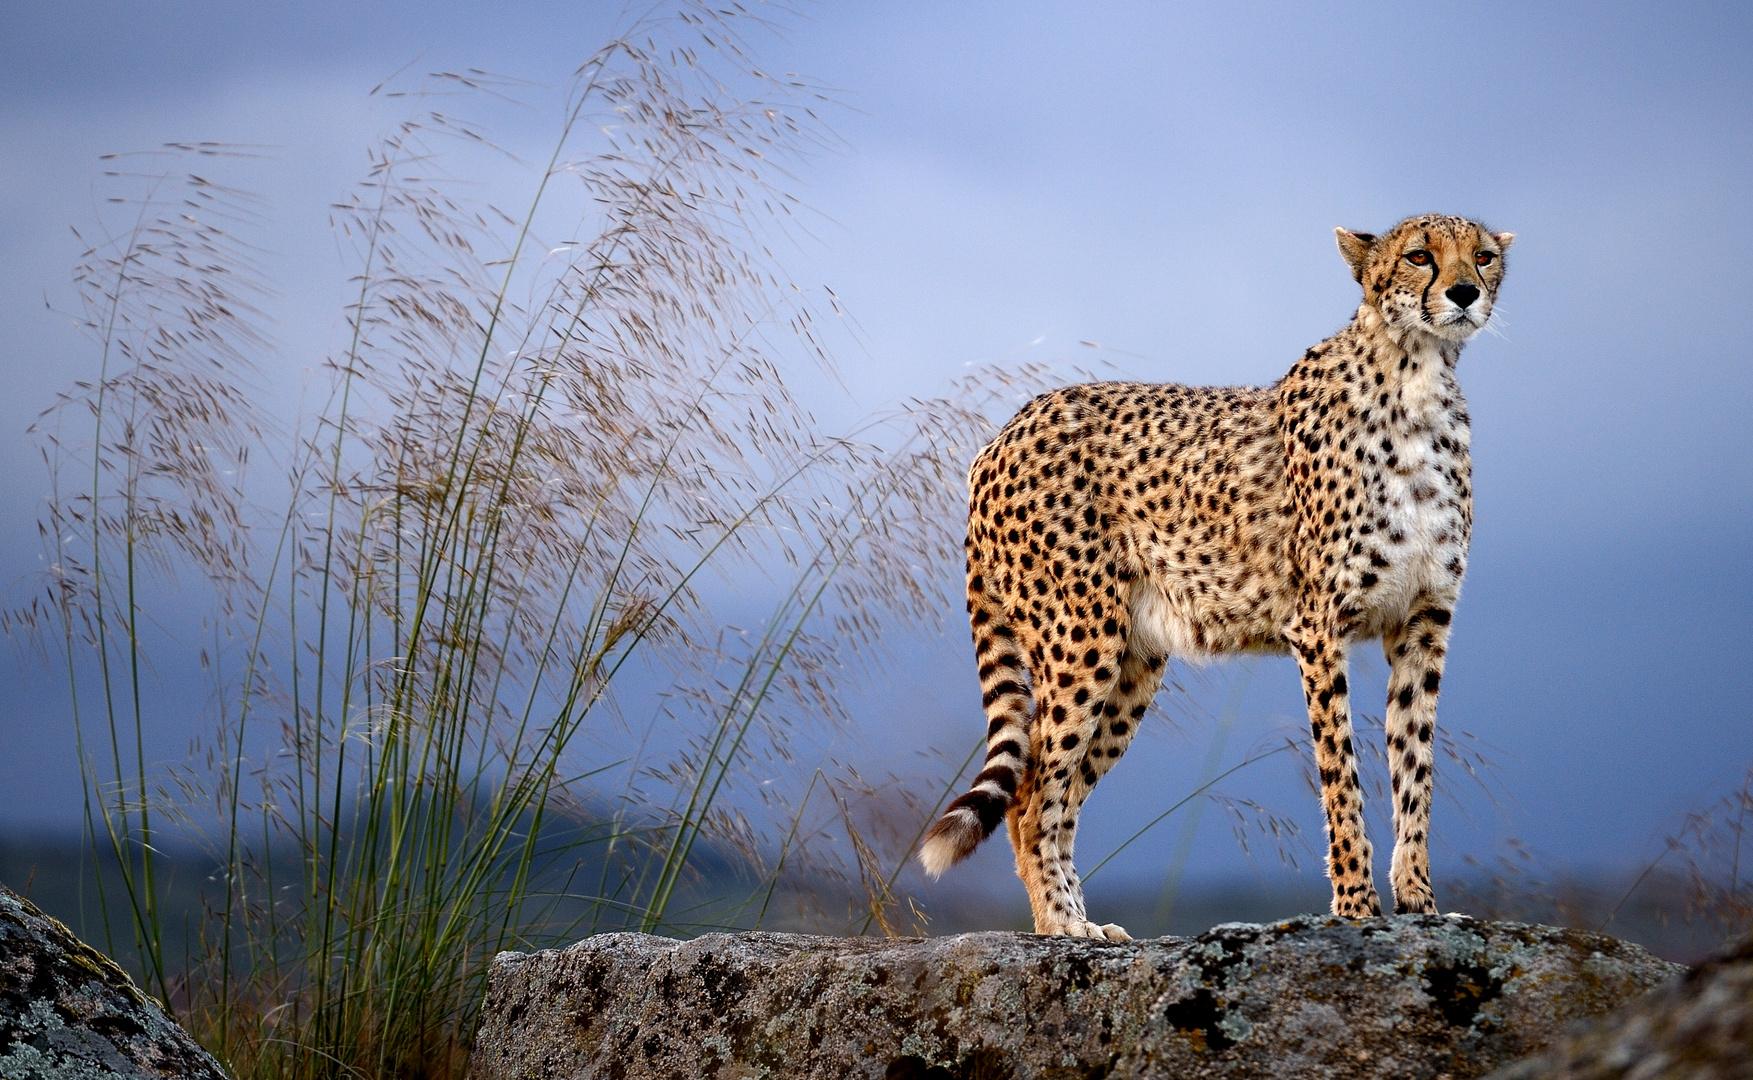 Gepardenfotografie in Spanien